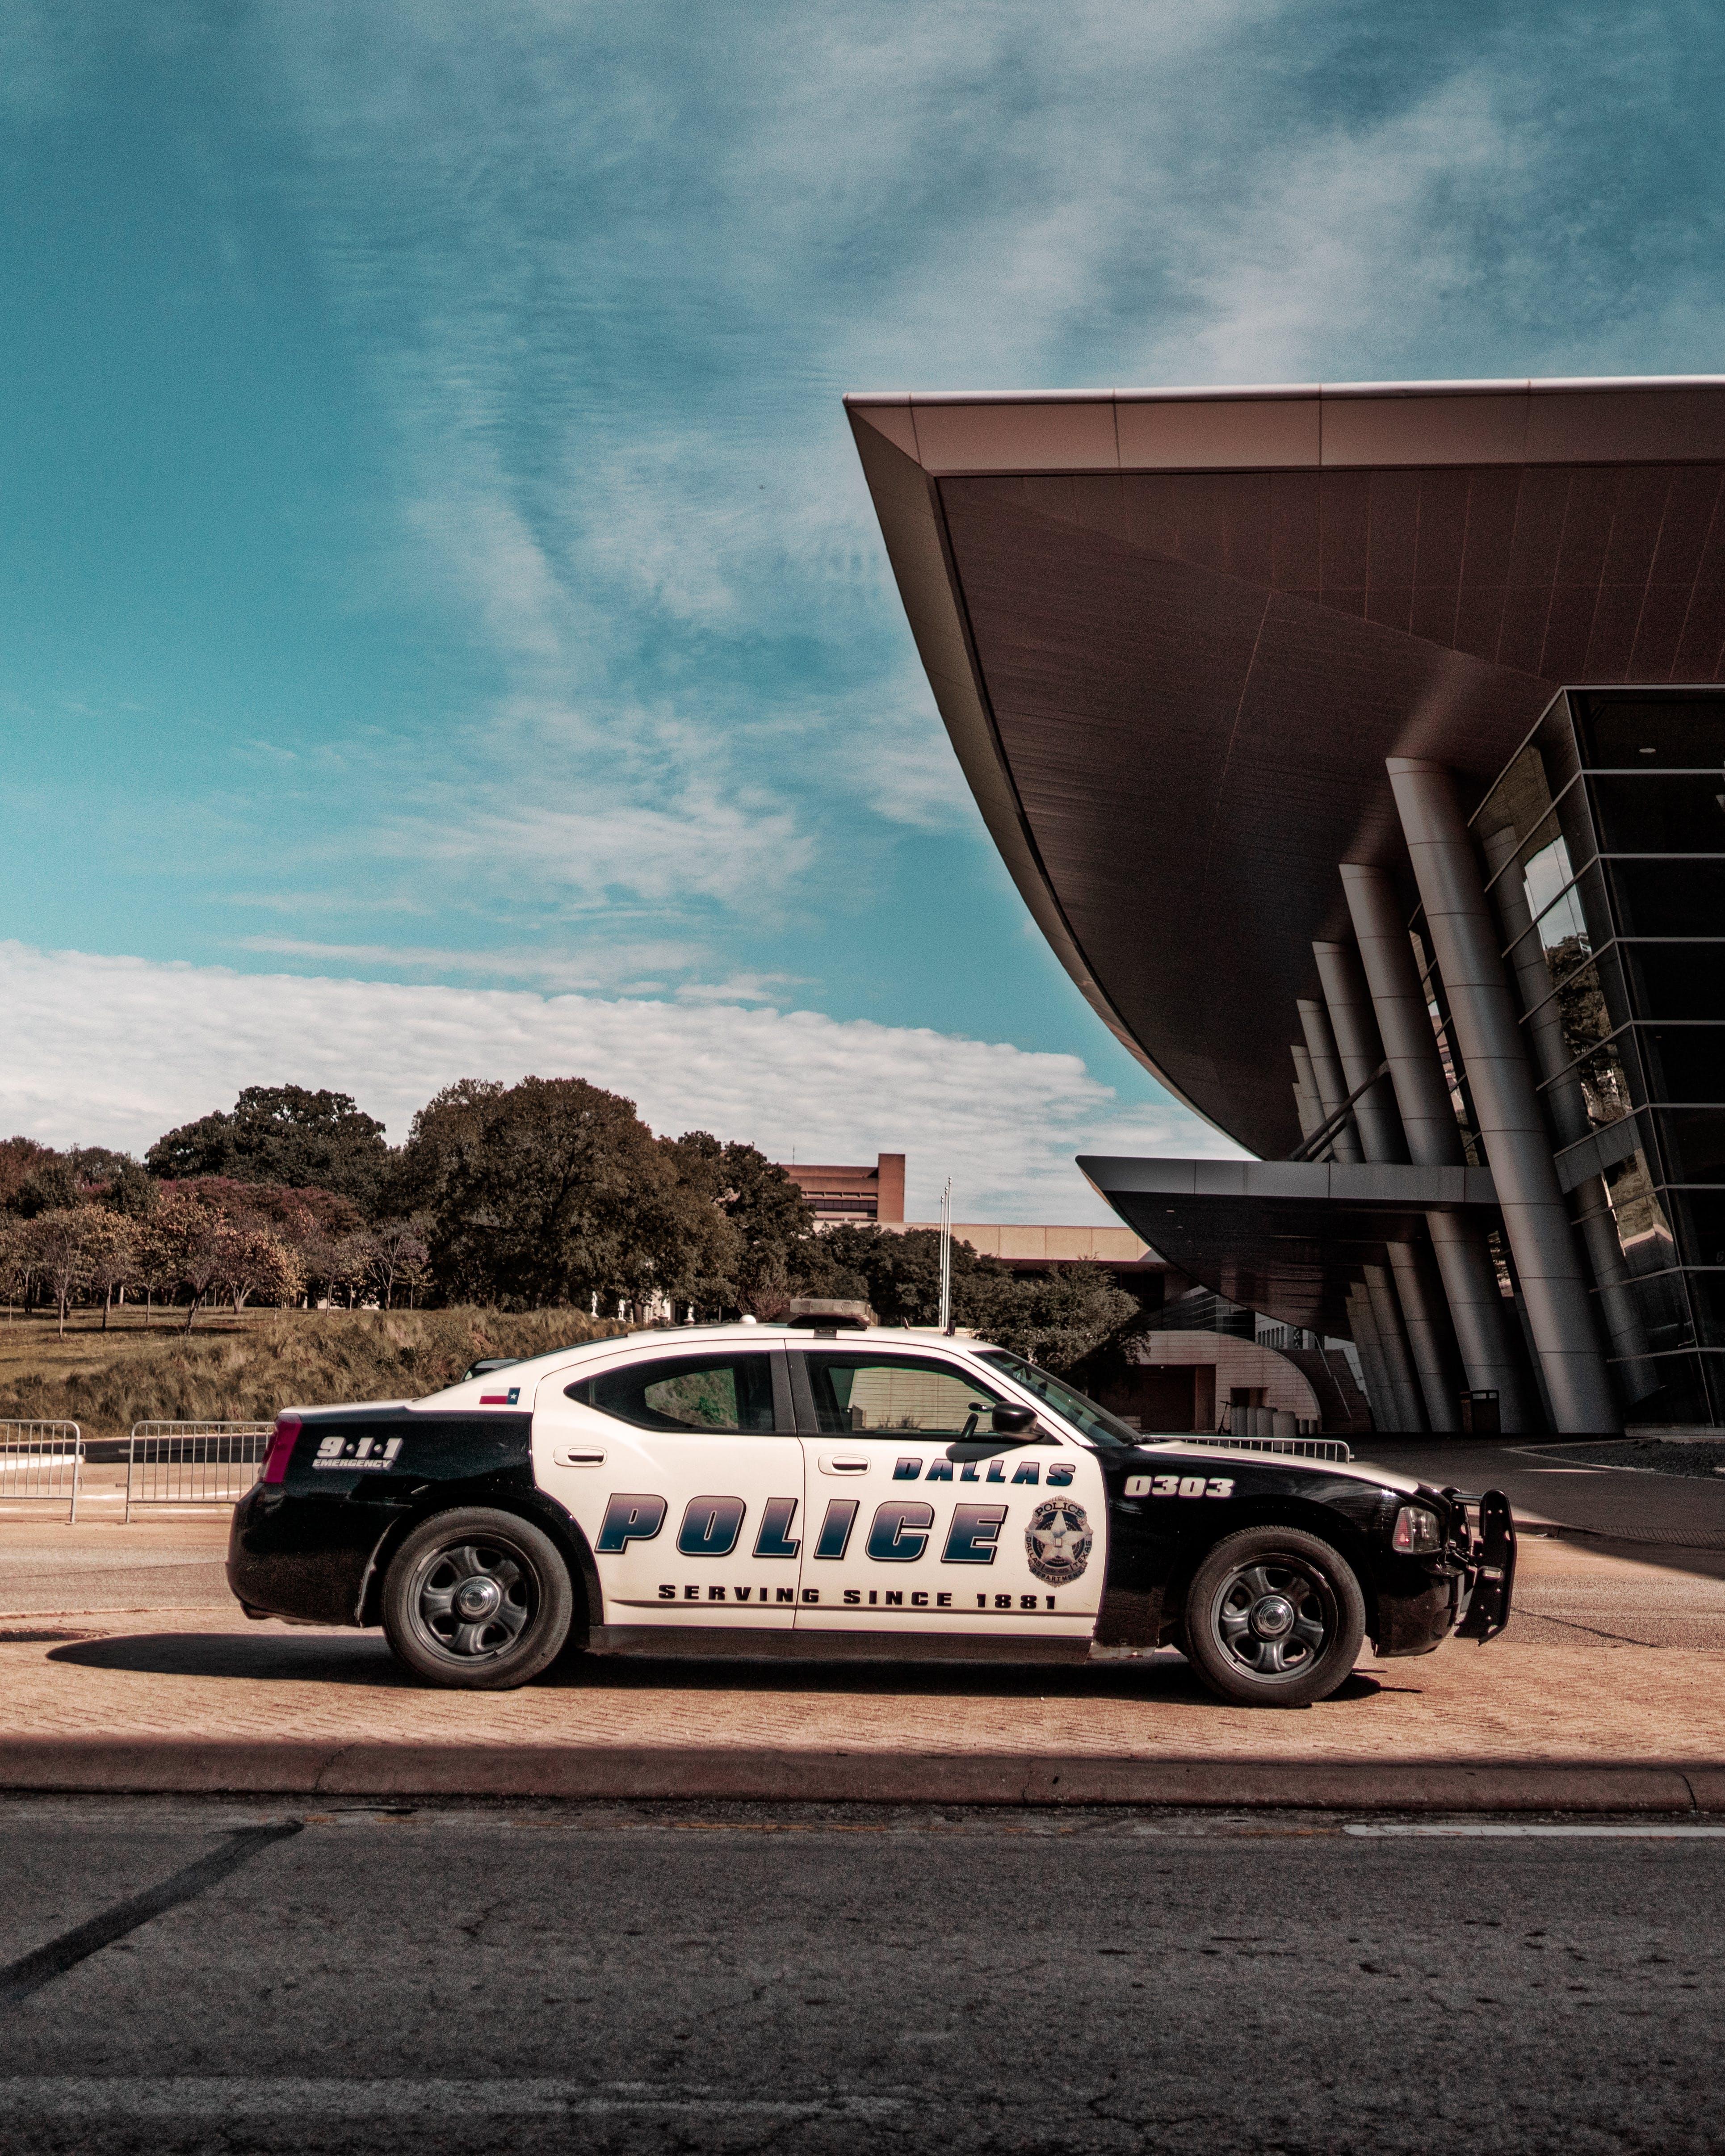 Police Car Parked Near Building